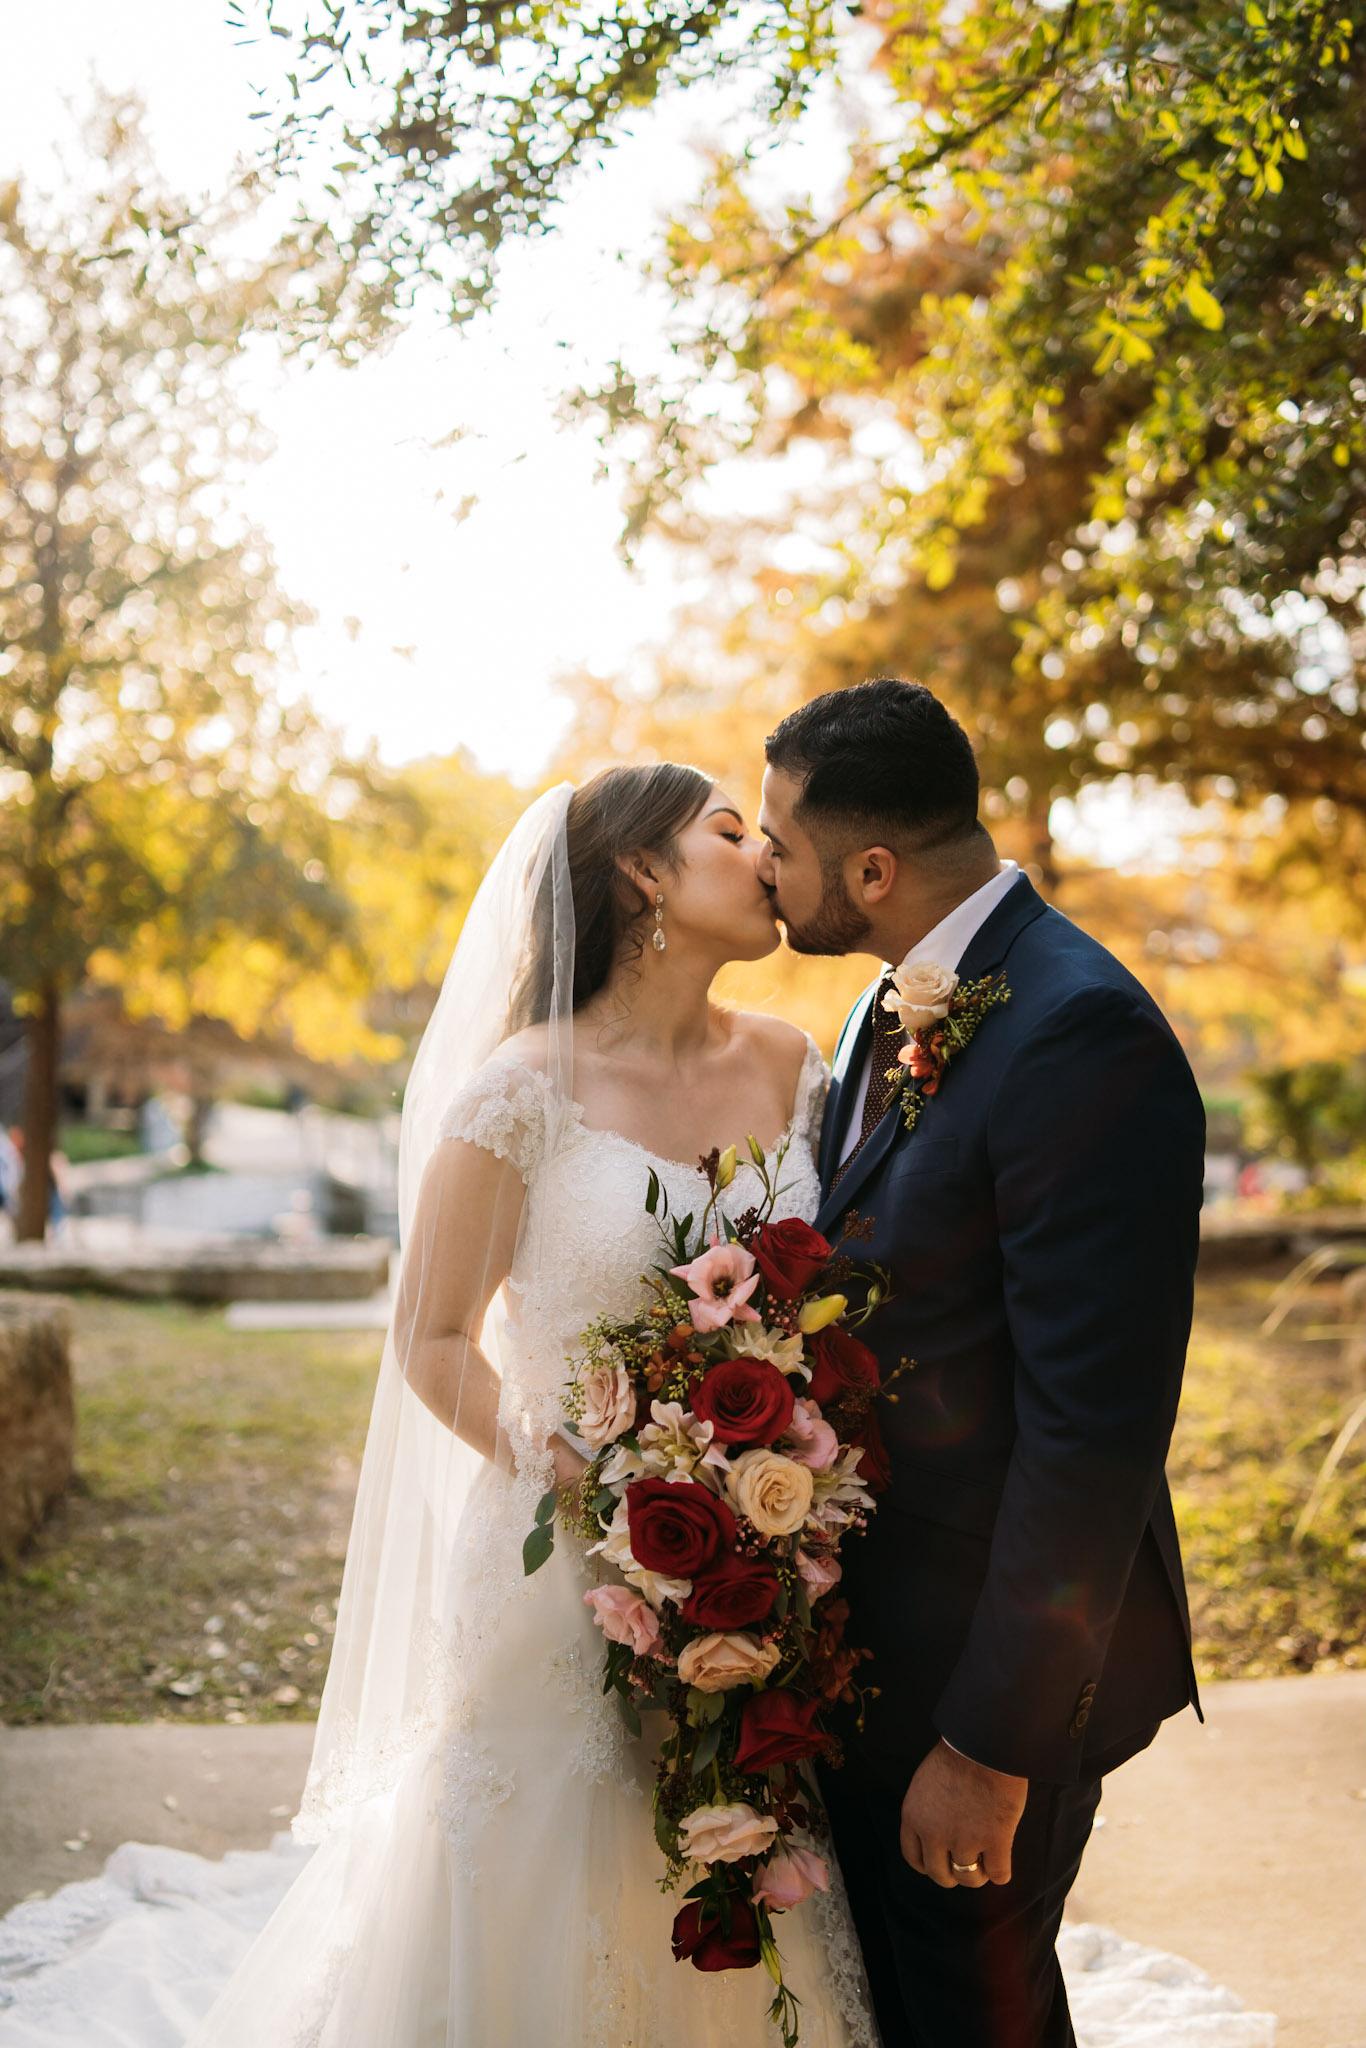 20181124-Brooke-TreyGarcia-Wedding-AdrianGarcia-FOMASCine_BR35366.jpg